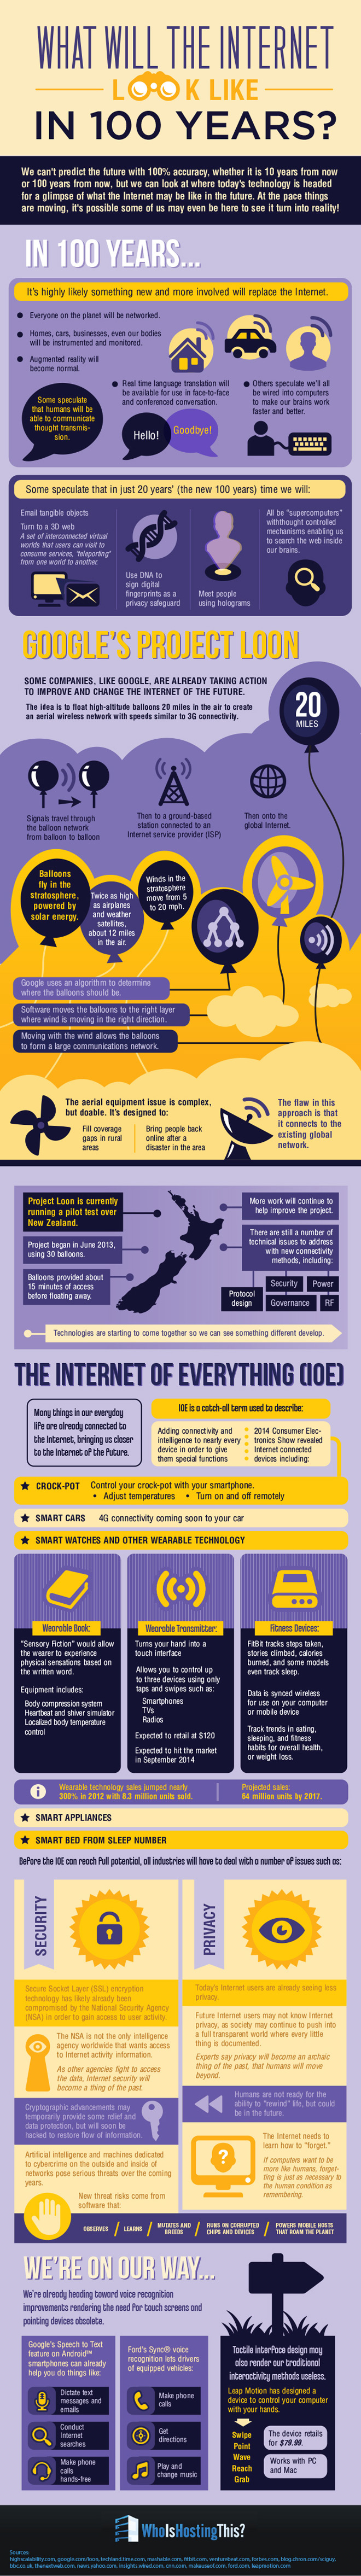 internet-100-years-infographic-blog-hostalia-hosting